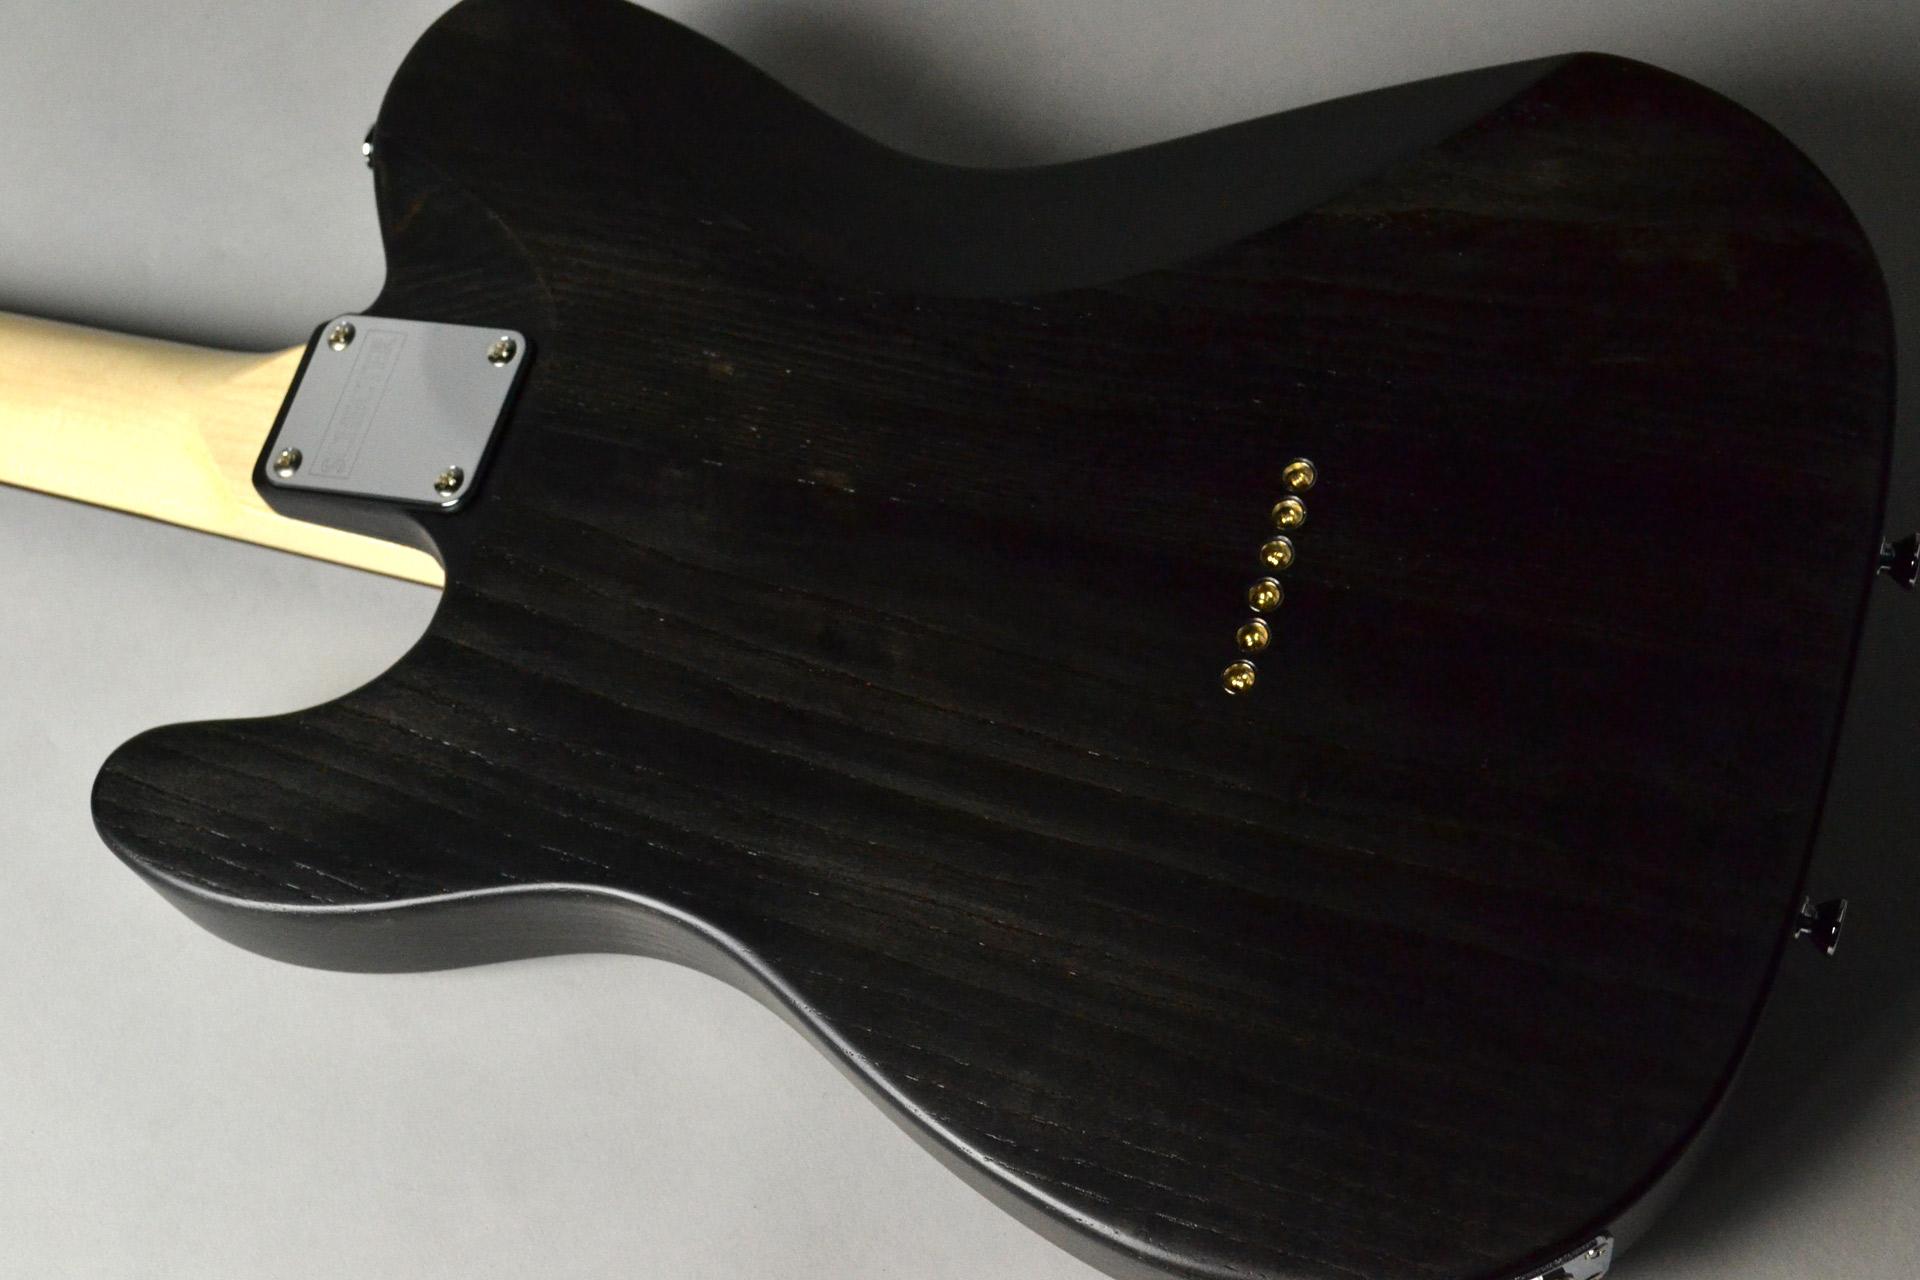 PS-S-PT-TH/R VT/Pro Gauge /Carbon Tint【限定生産】のボディバック-アップ画像